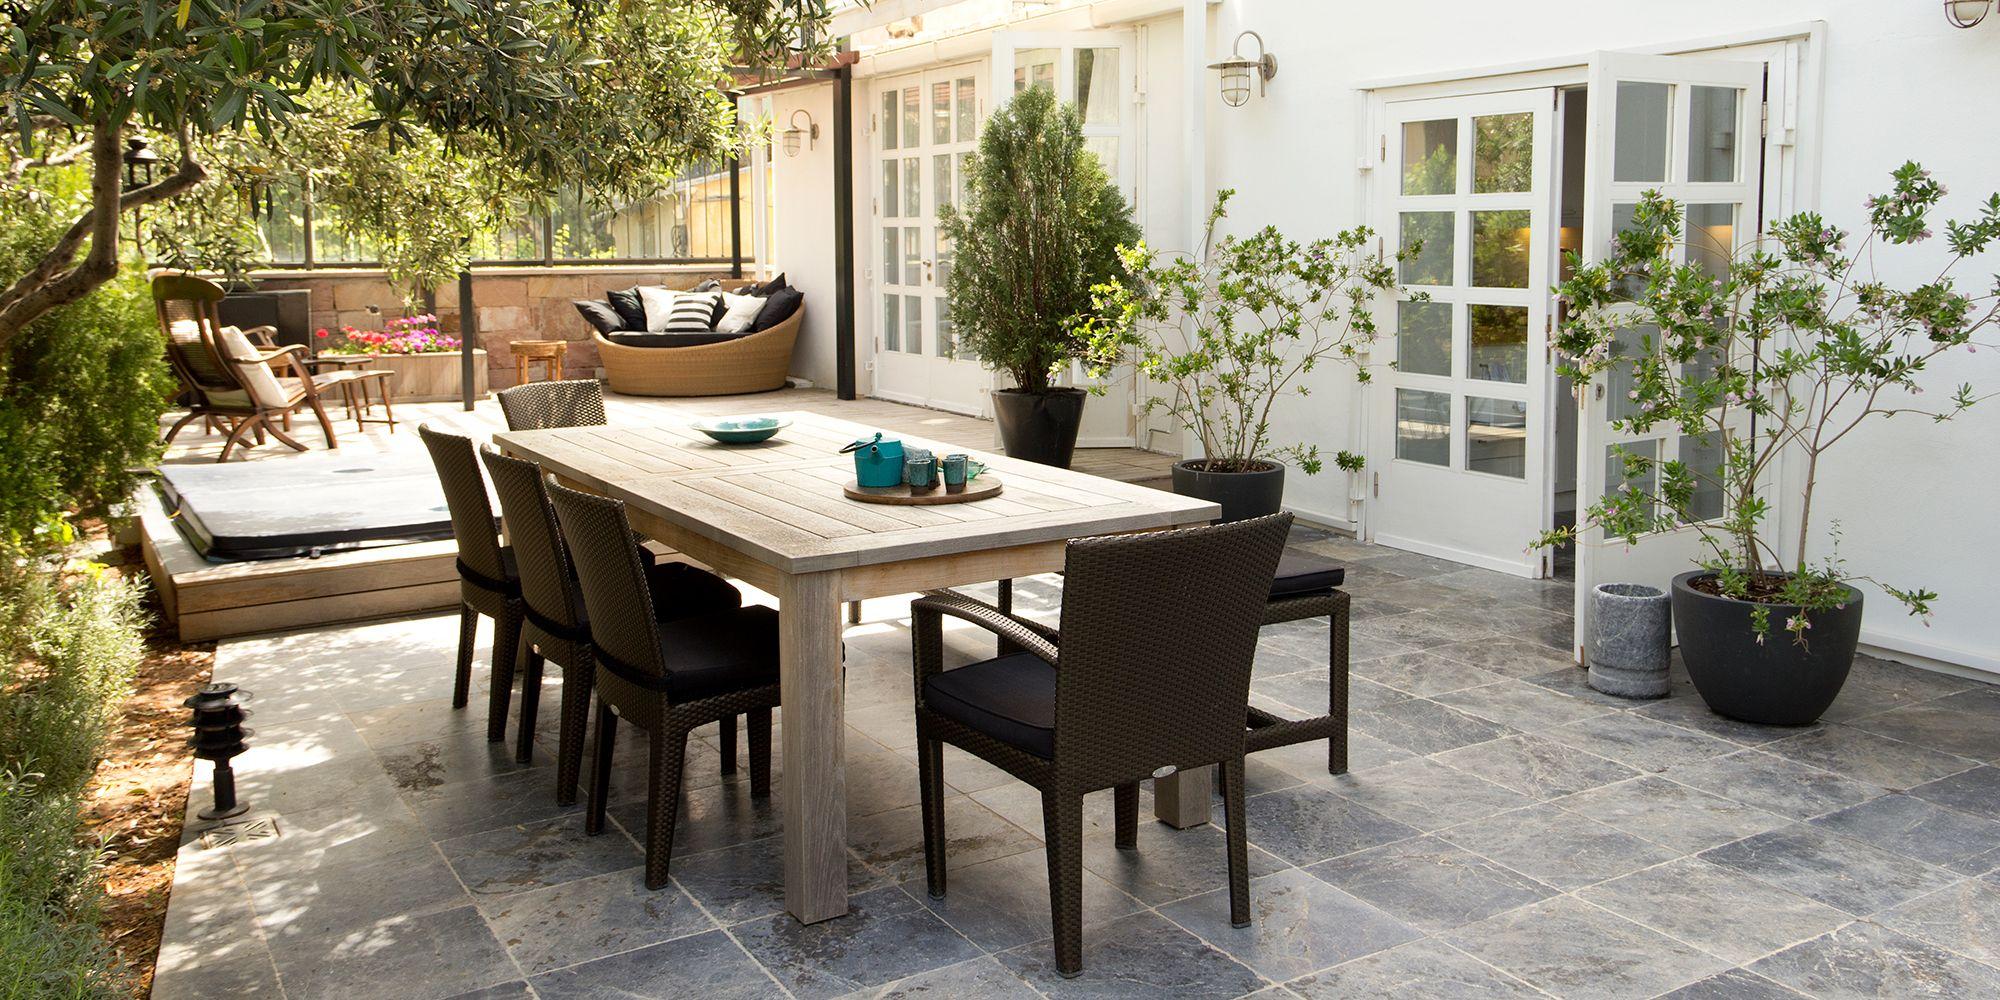 furniture patio furniture set up